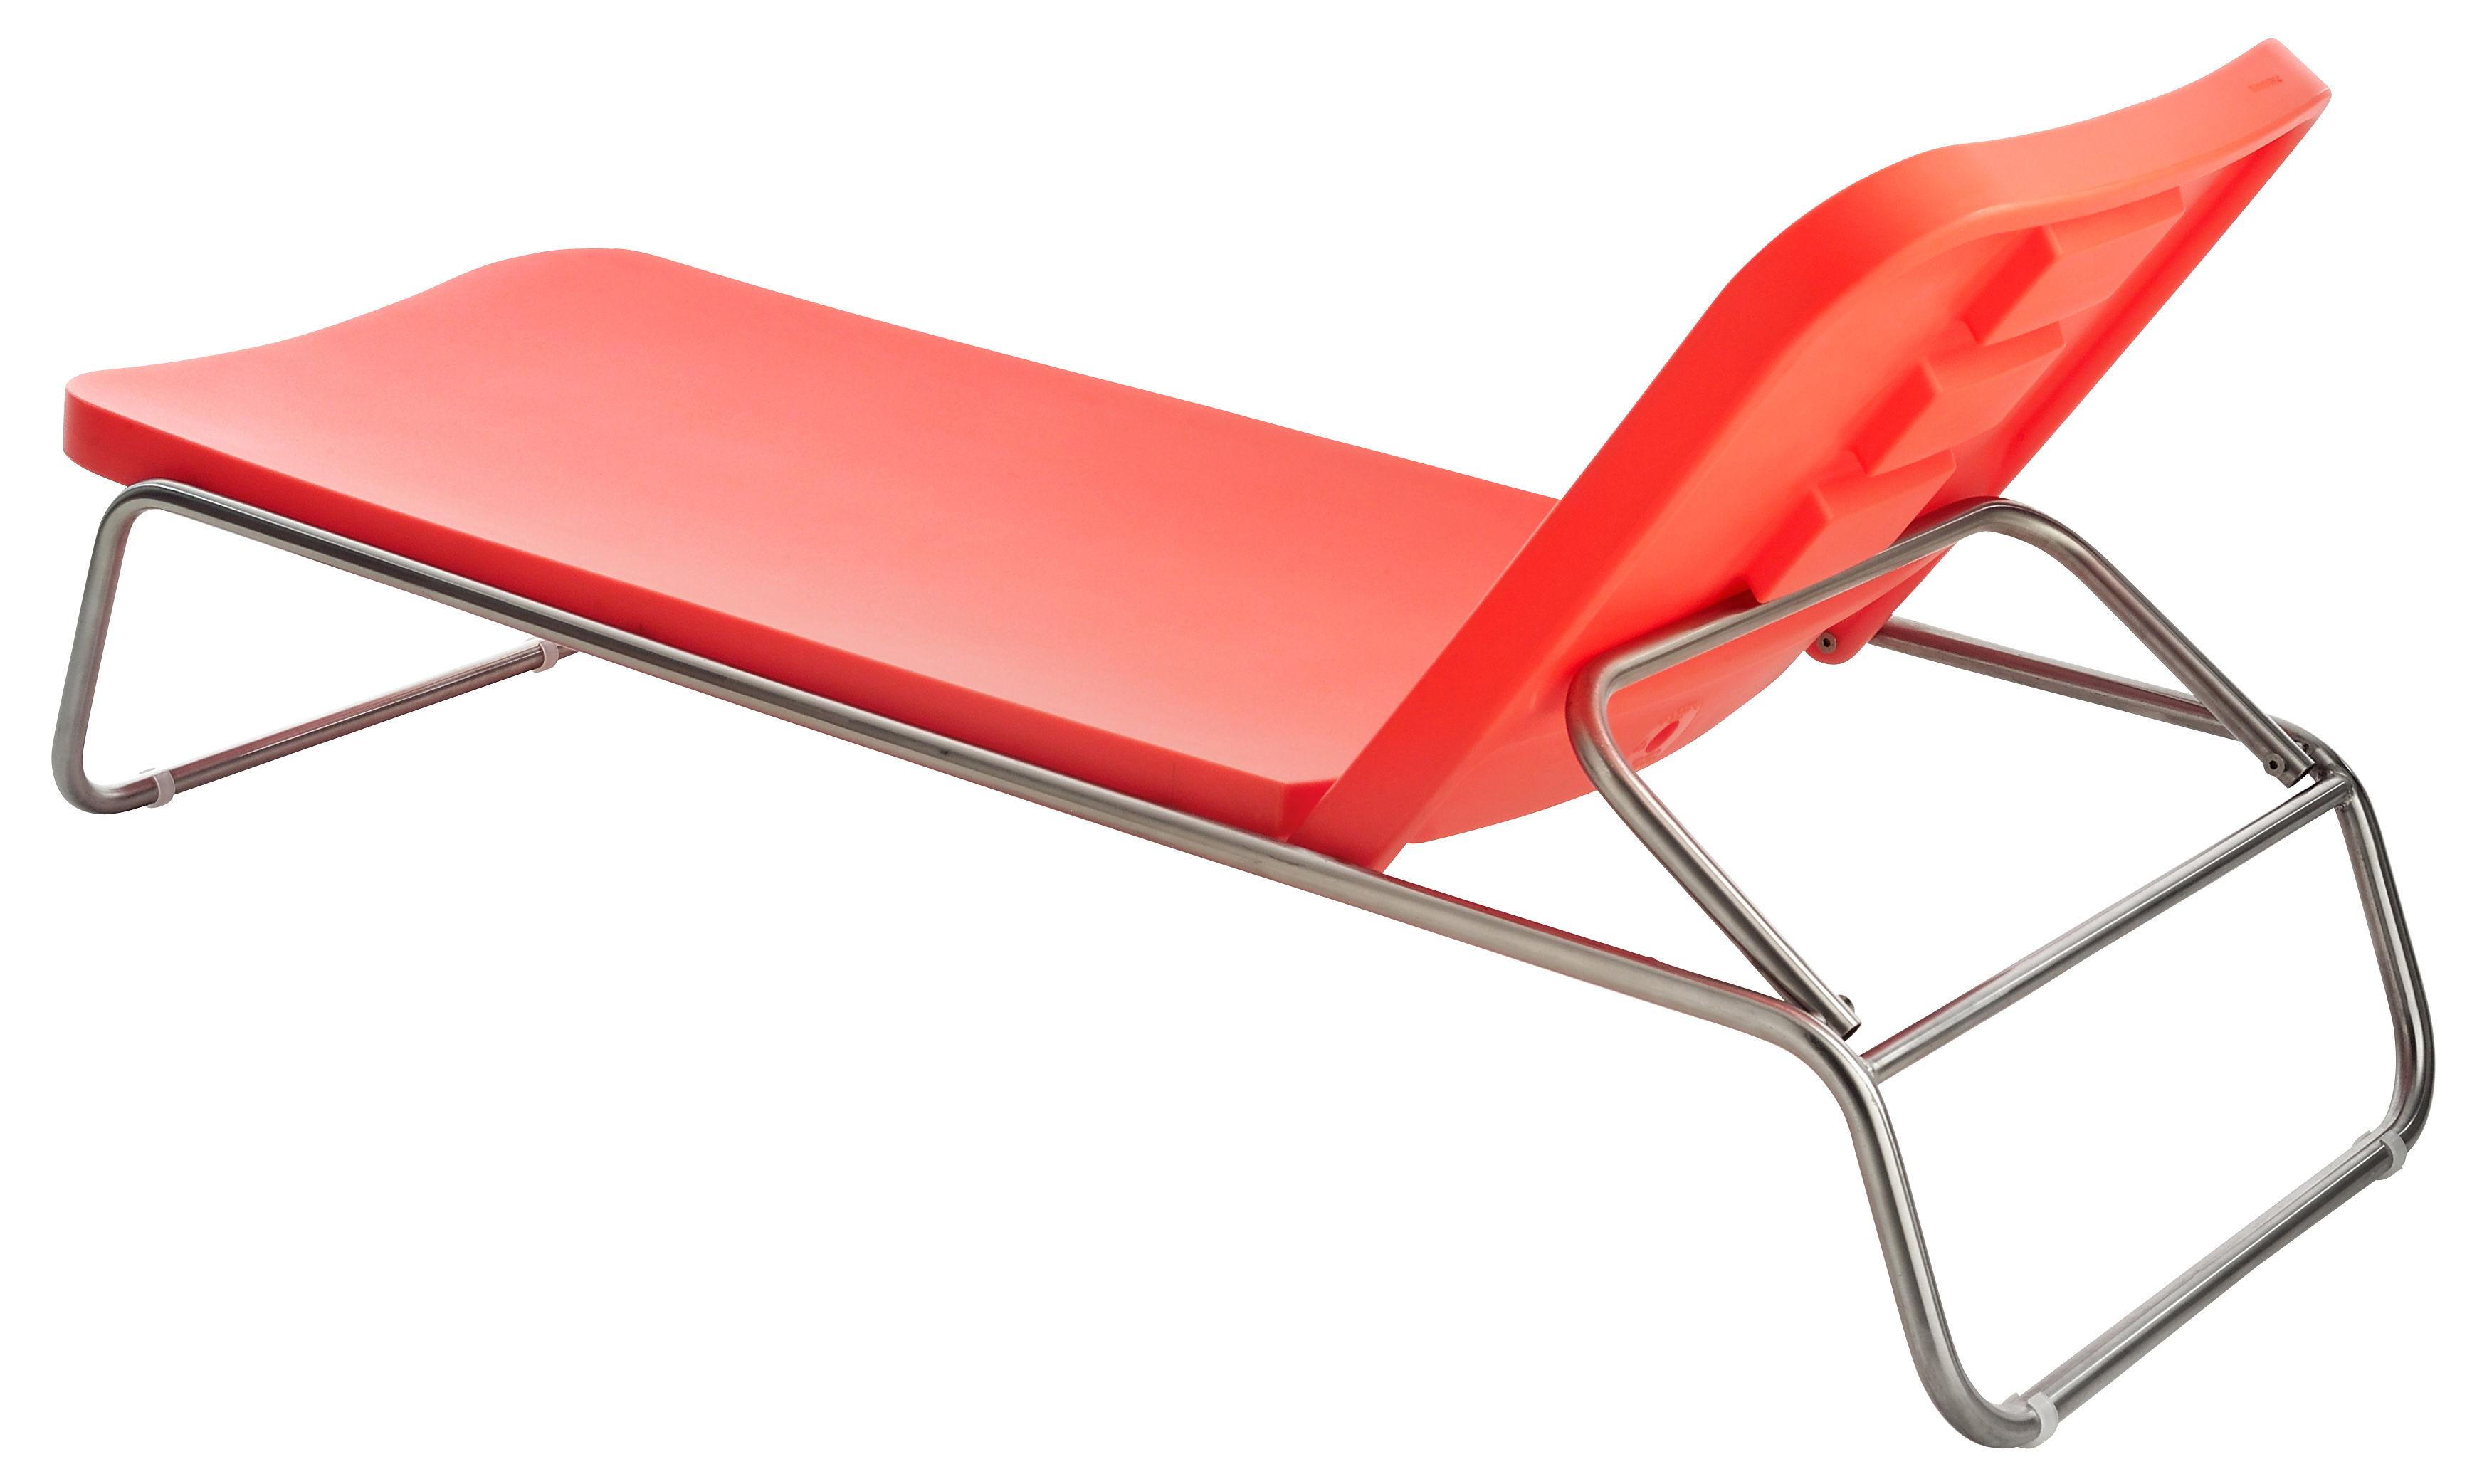 Outdoor - Sun Loungers & Hammocks - Time Out Sun lounger - Adjustable backrest by Serralunga - Orange - Brushed steel, Polythene